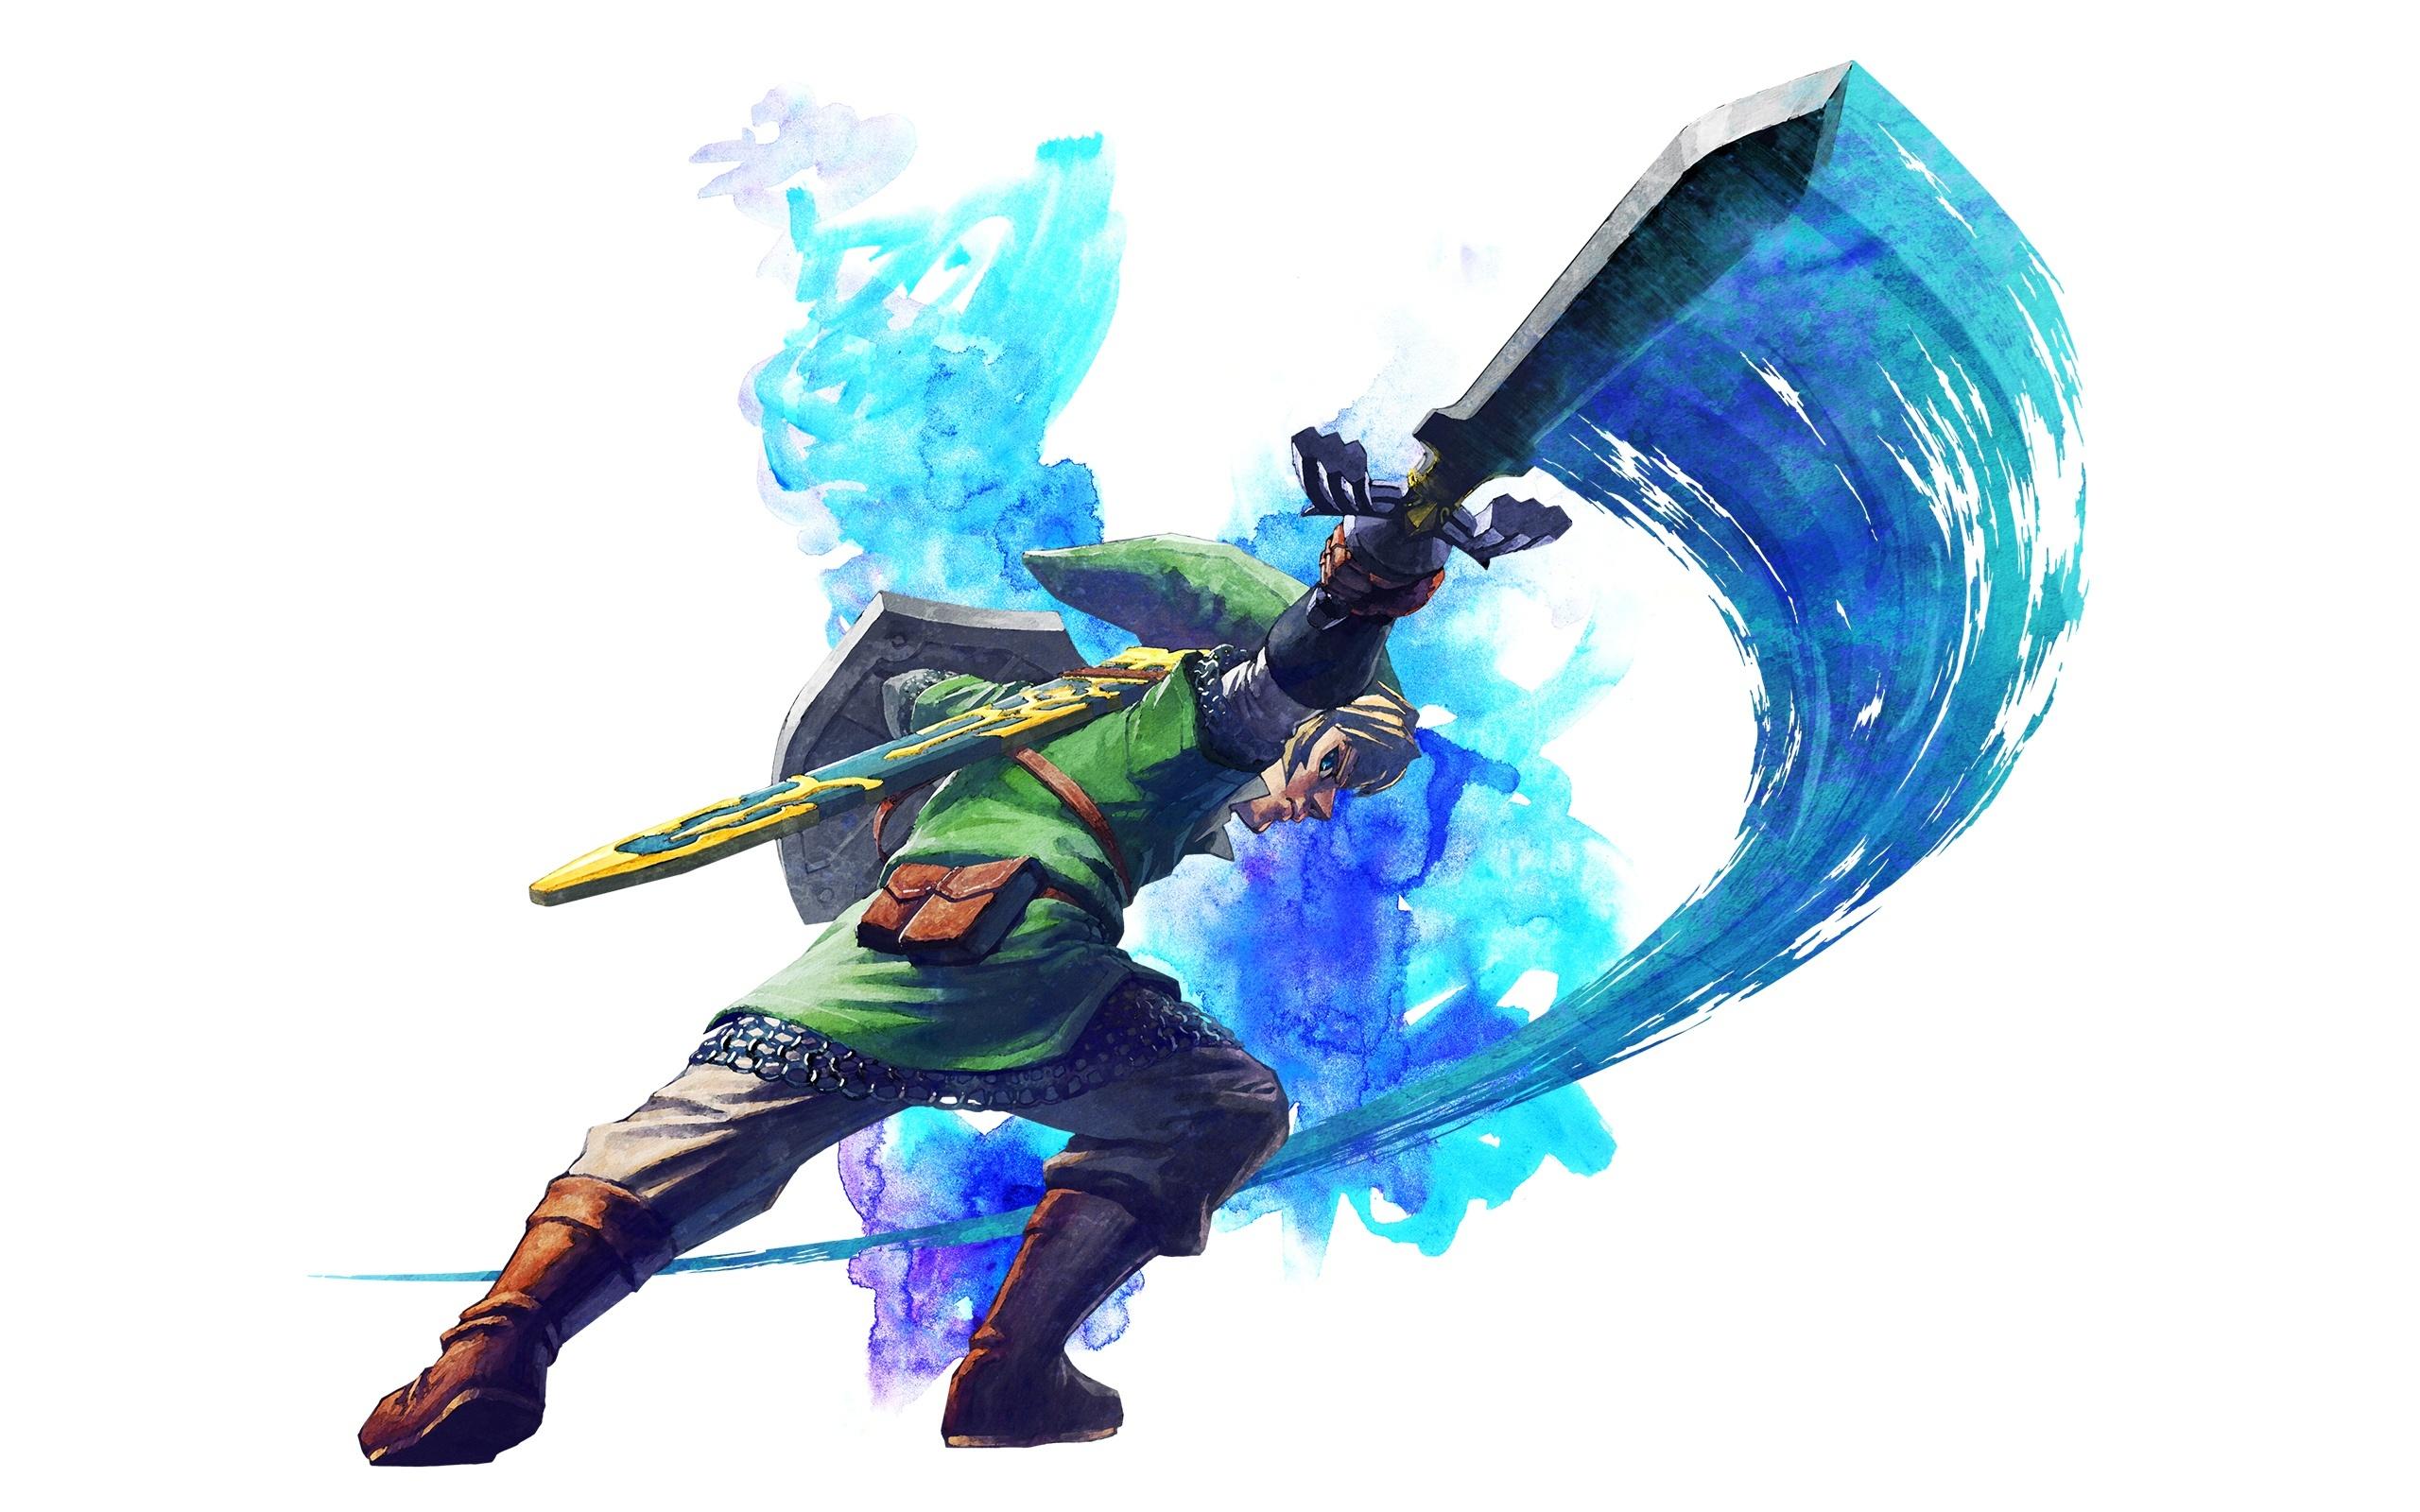 General 2560x1600 The Legend of Zelda the legend of zelda: skyward sword white background digital art Link simple background video games video game art sword shield fantasy art